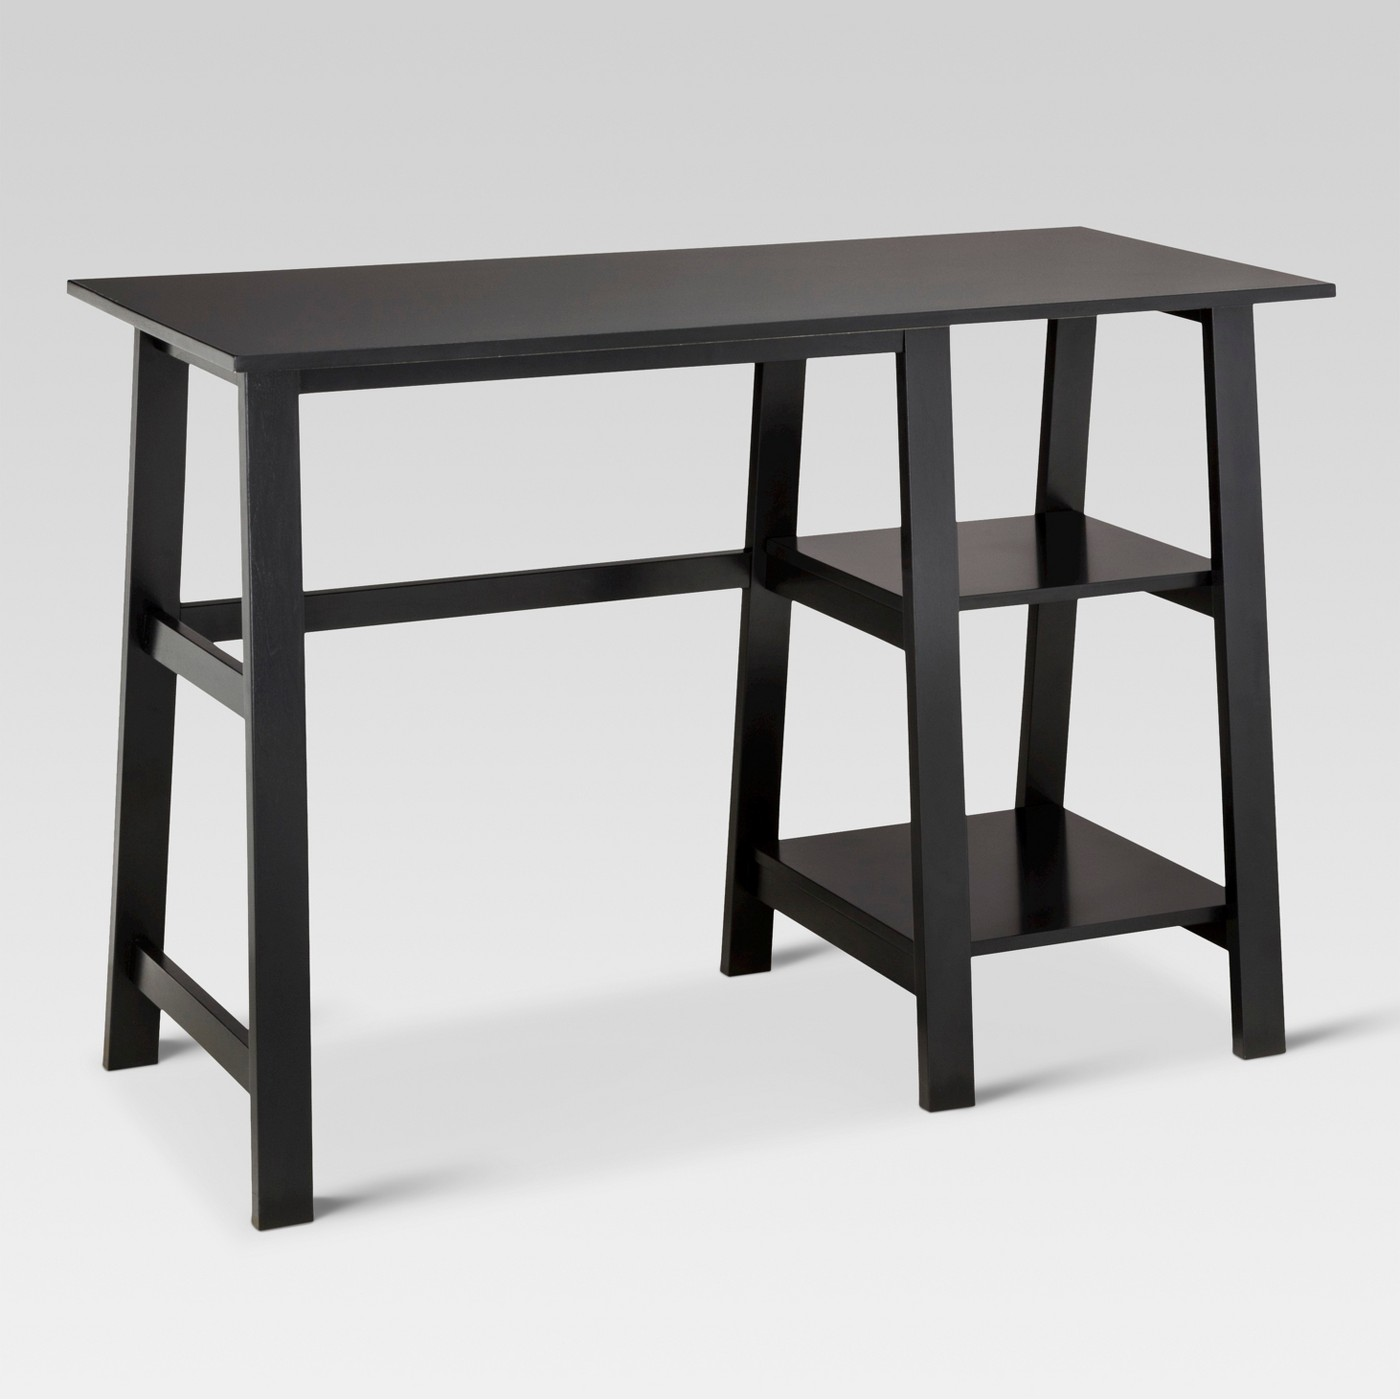 Trestle Desk - Threshold™ - image 1 of 1